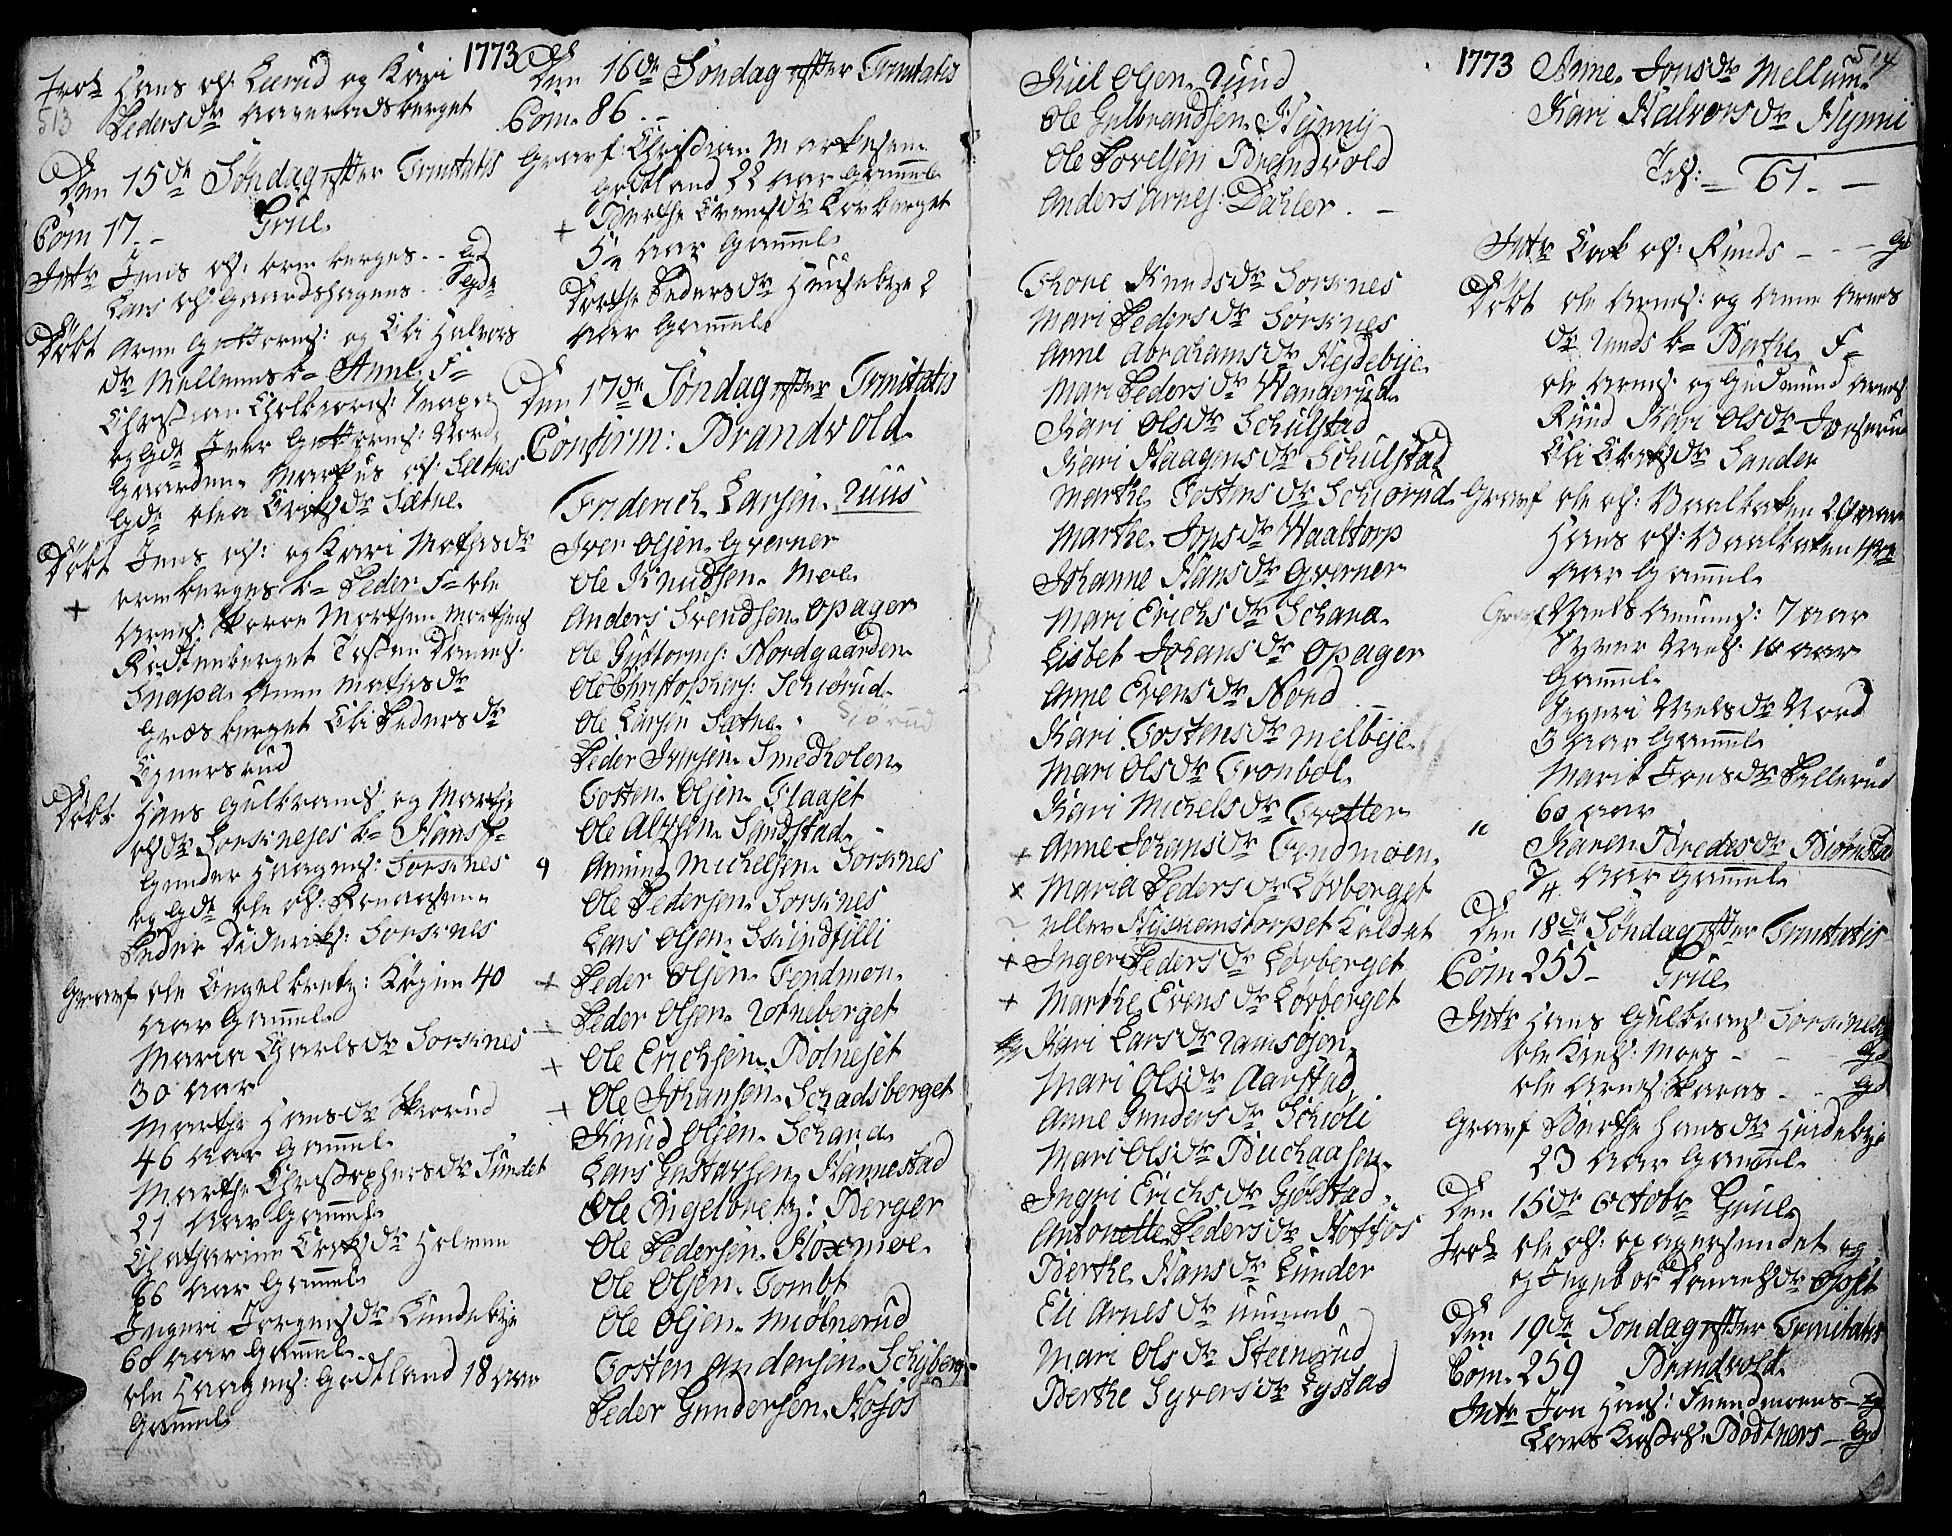 SAH, Grue prestekontor, Ministerialbok nr. 2, 1749-1774, s. 513-514